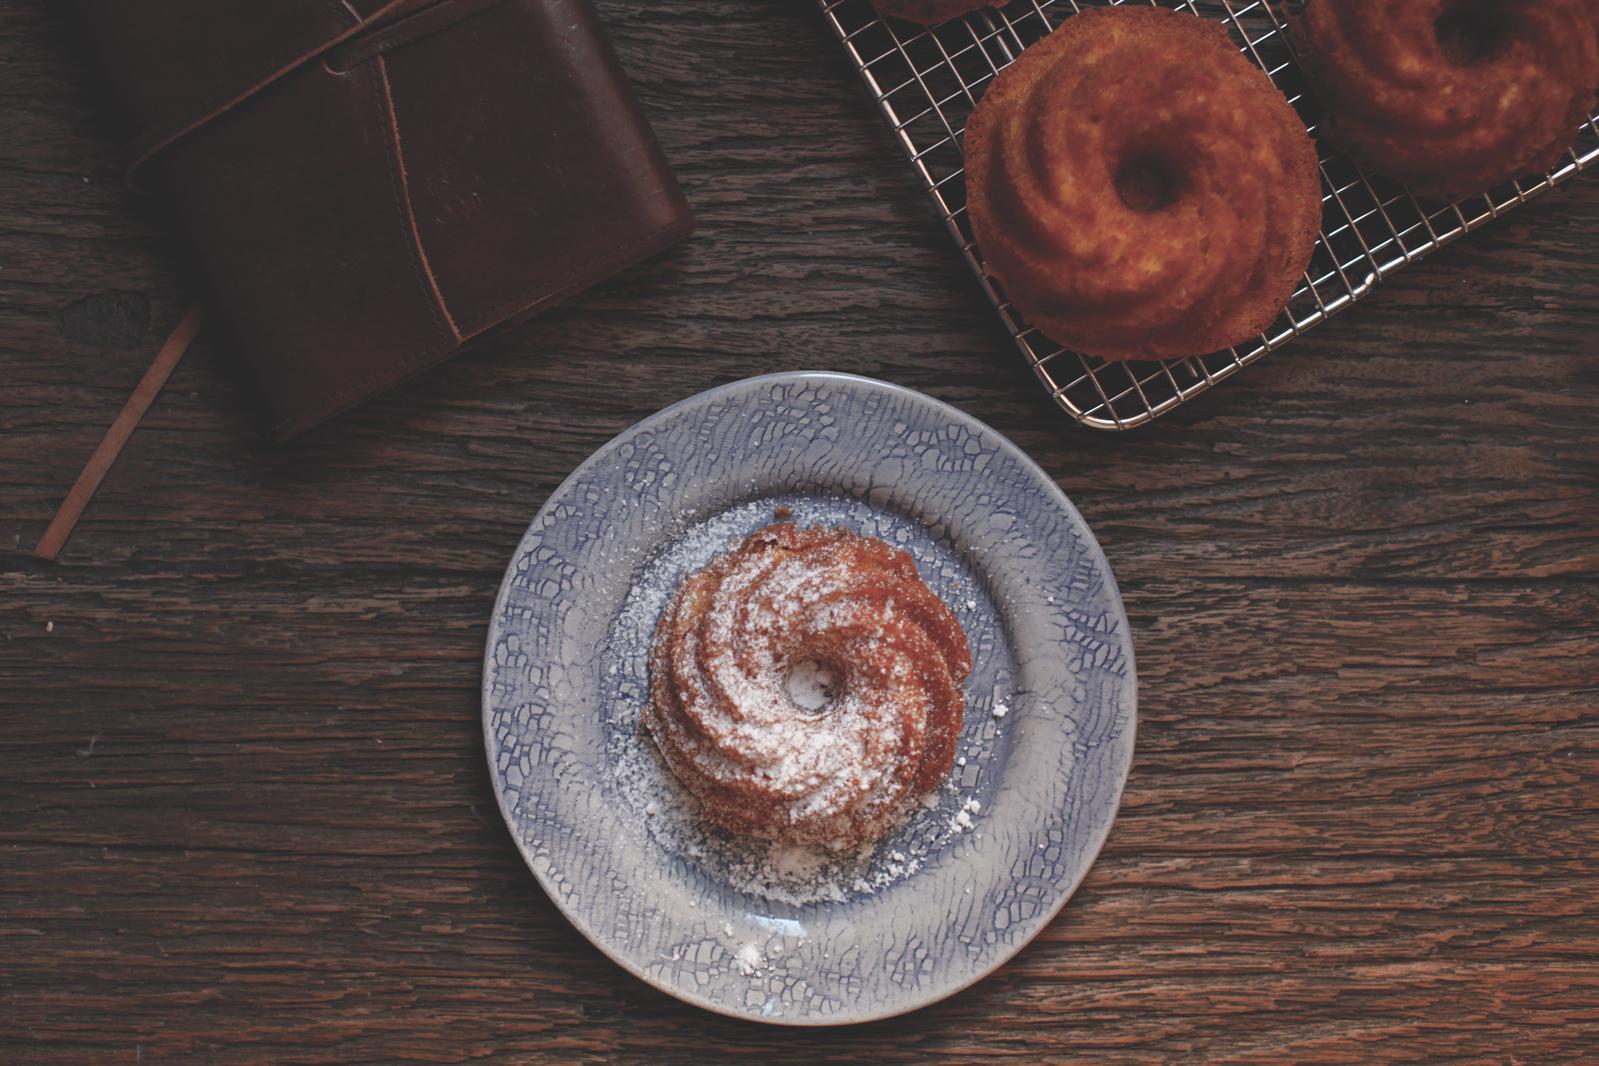 pici-e-castagne-bundt-cake-5-2